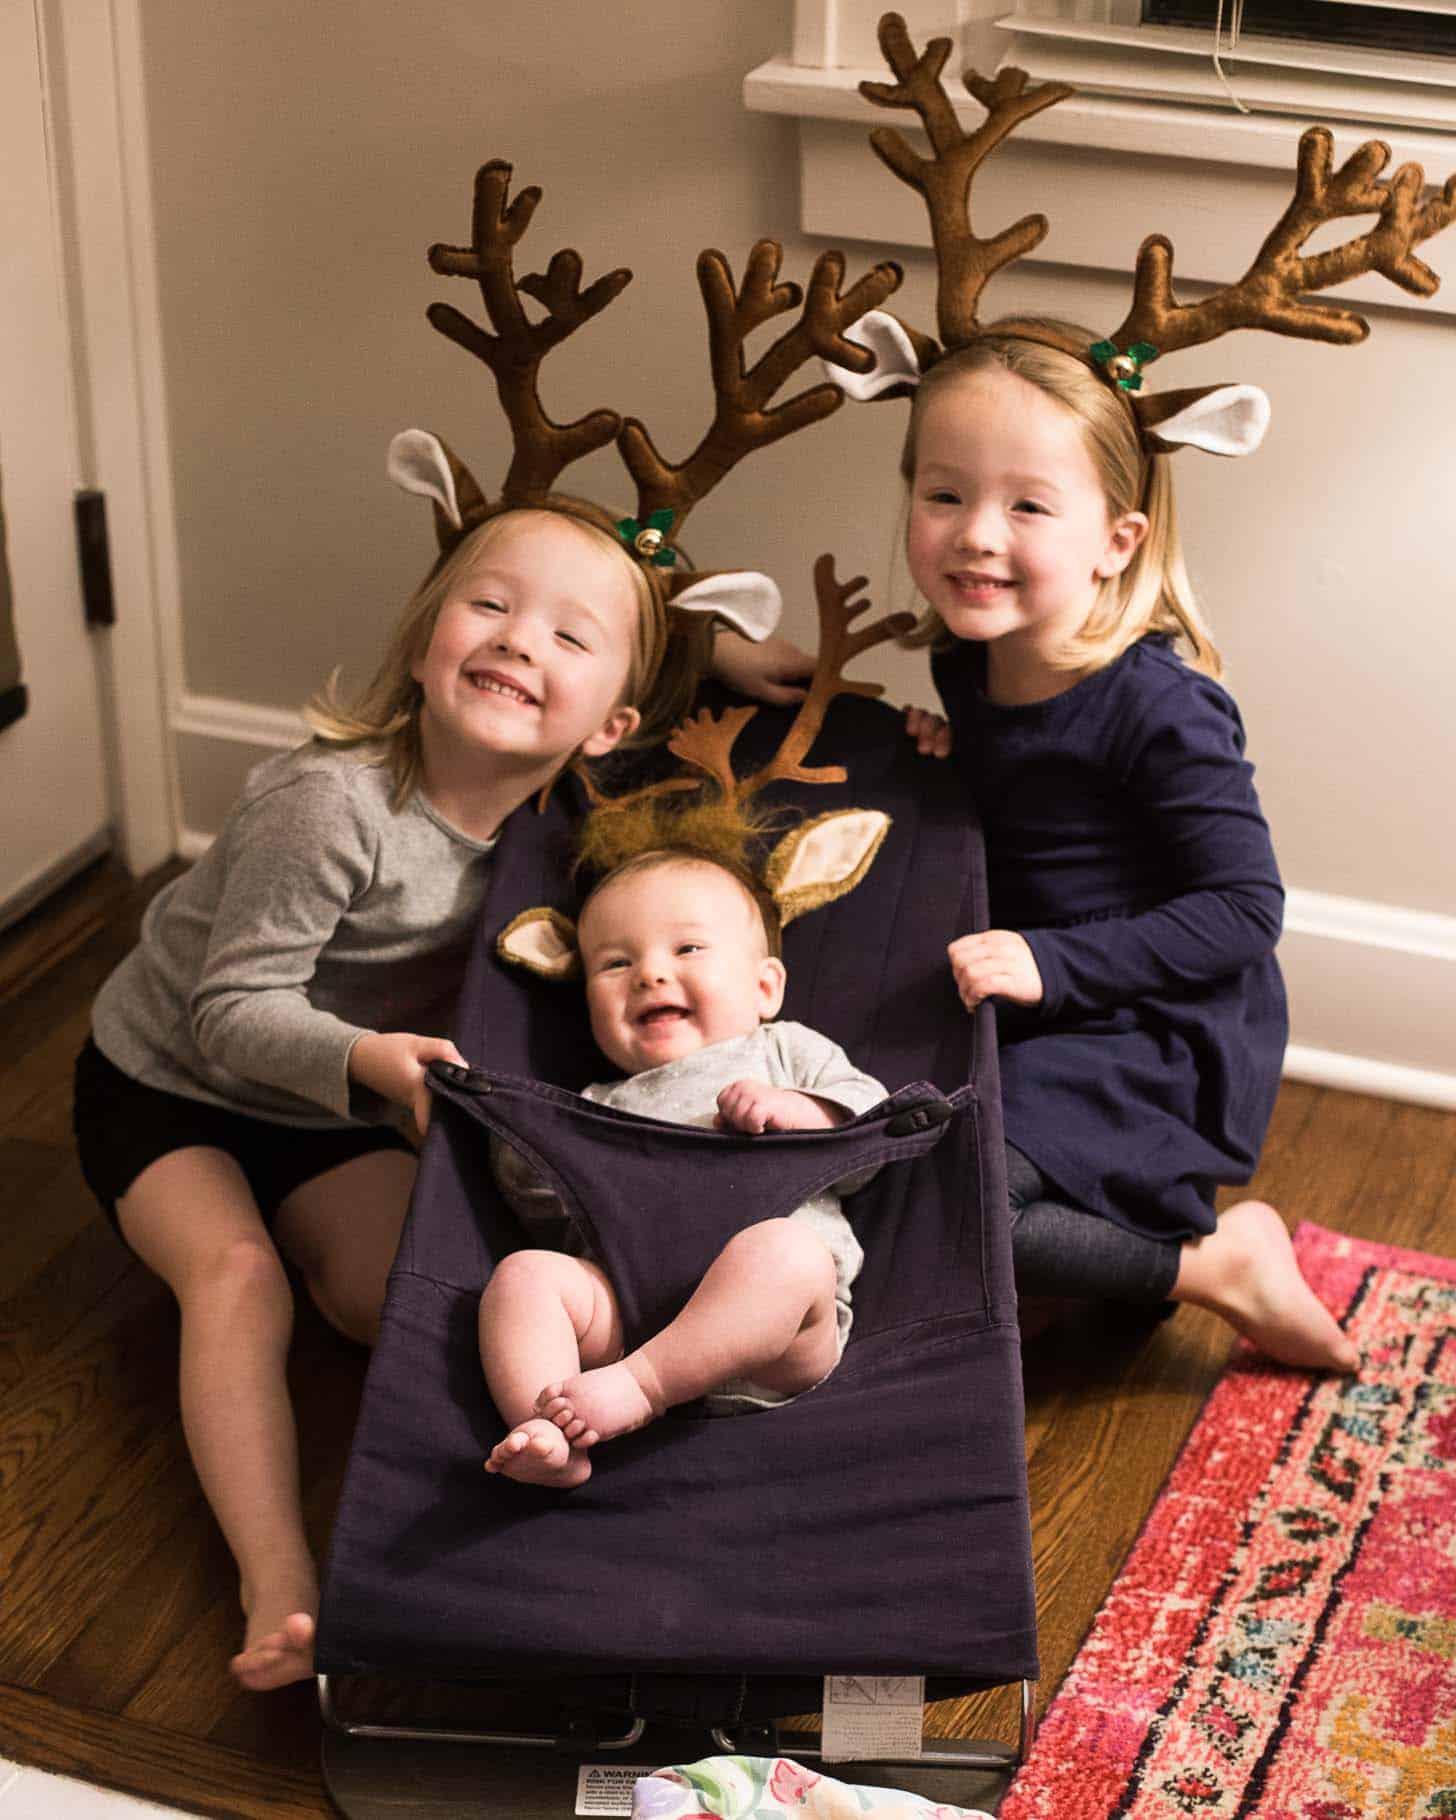 little girls in reindeer antlers